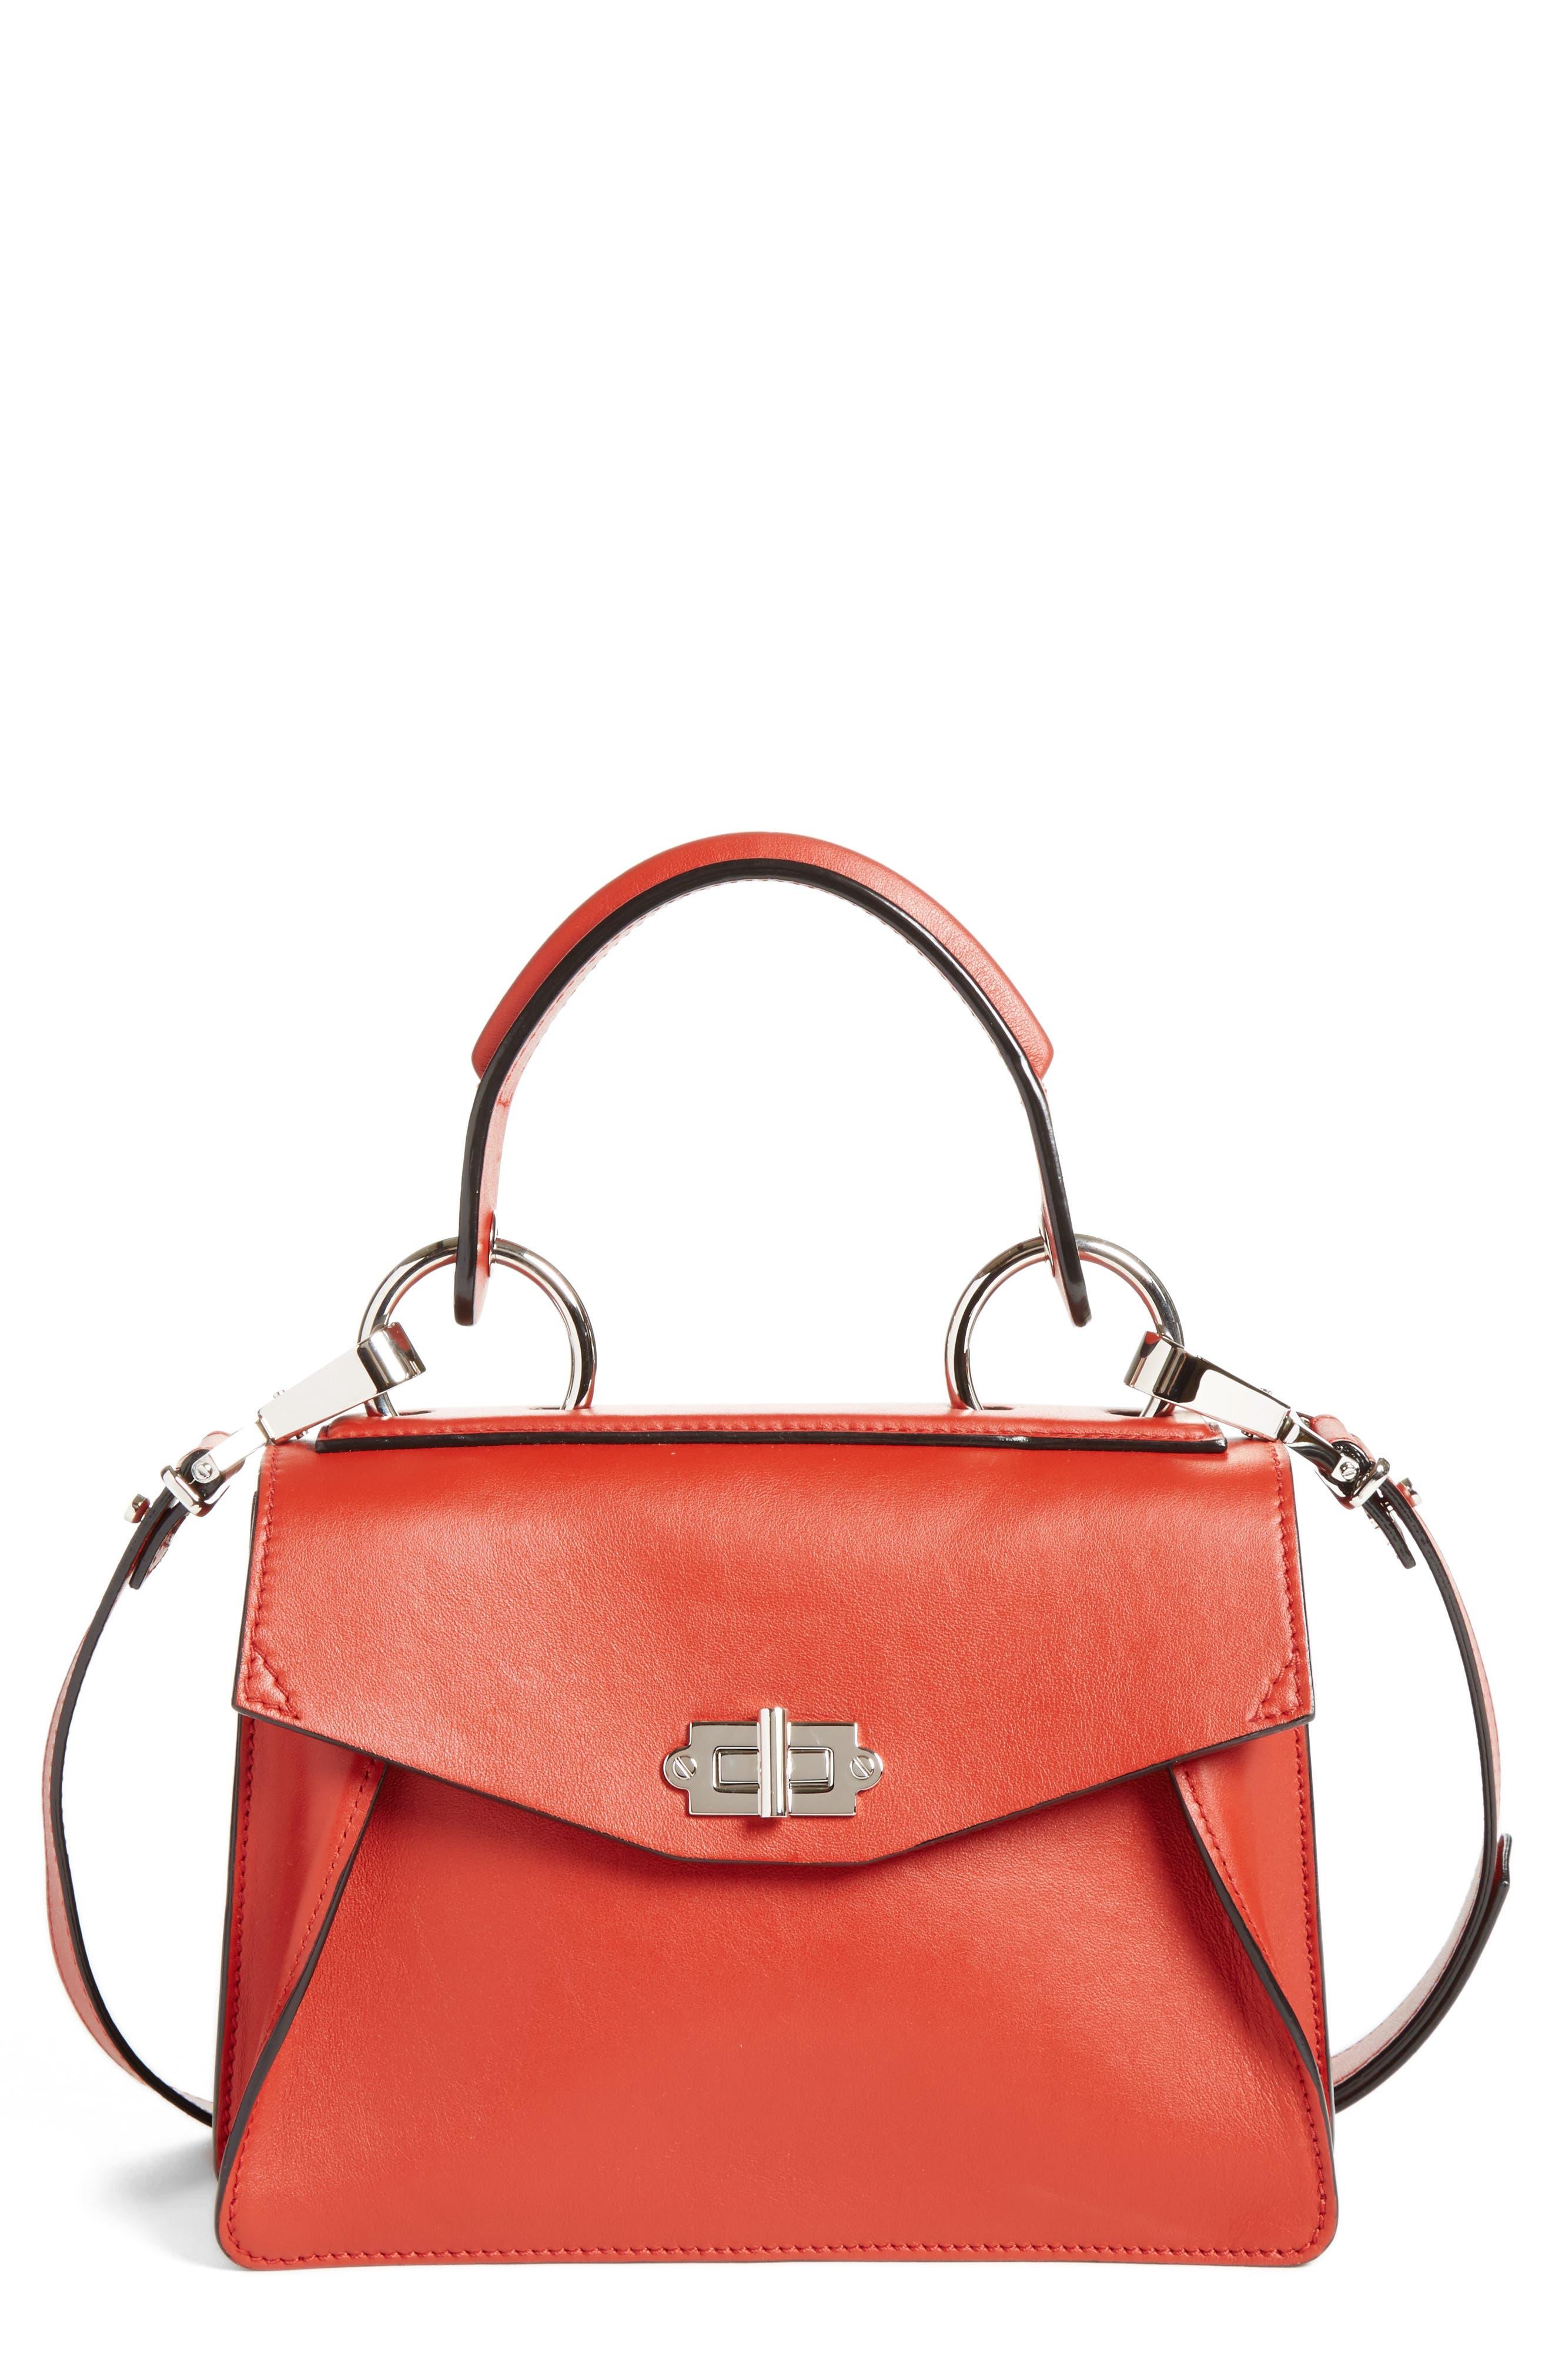 'Small Hava' Top Handle Calfskin Leather Satchel,                             Main thumbnail 1, color,                             Brick